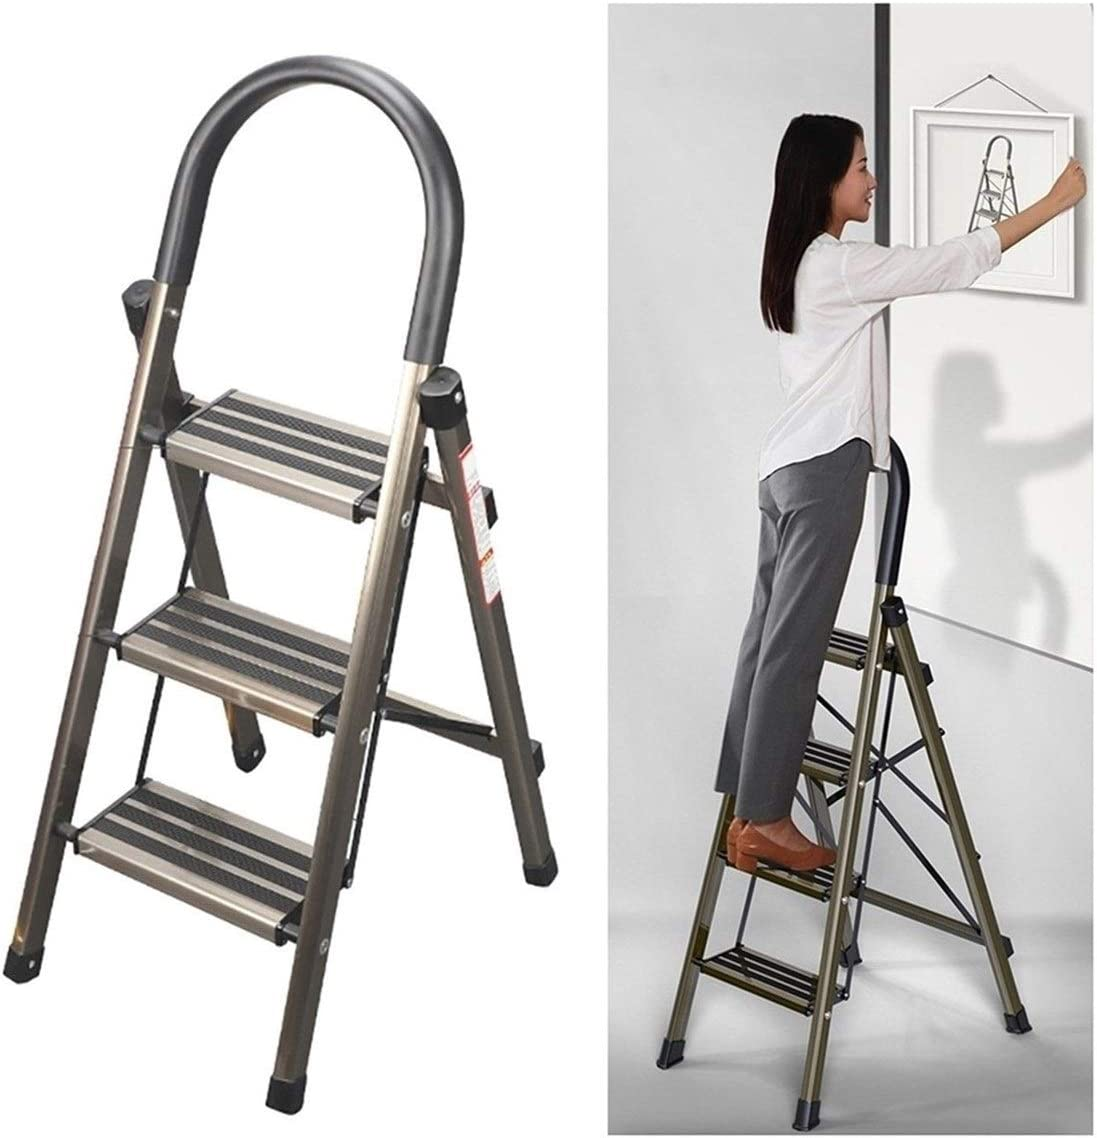 Hailong 3-5 Superior Popular overseas Step Stool Ladder with Portable R Folding Anti-Slip